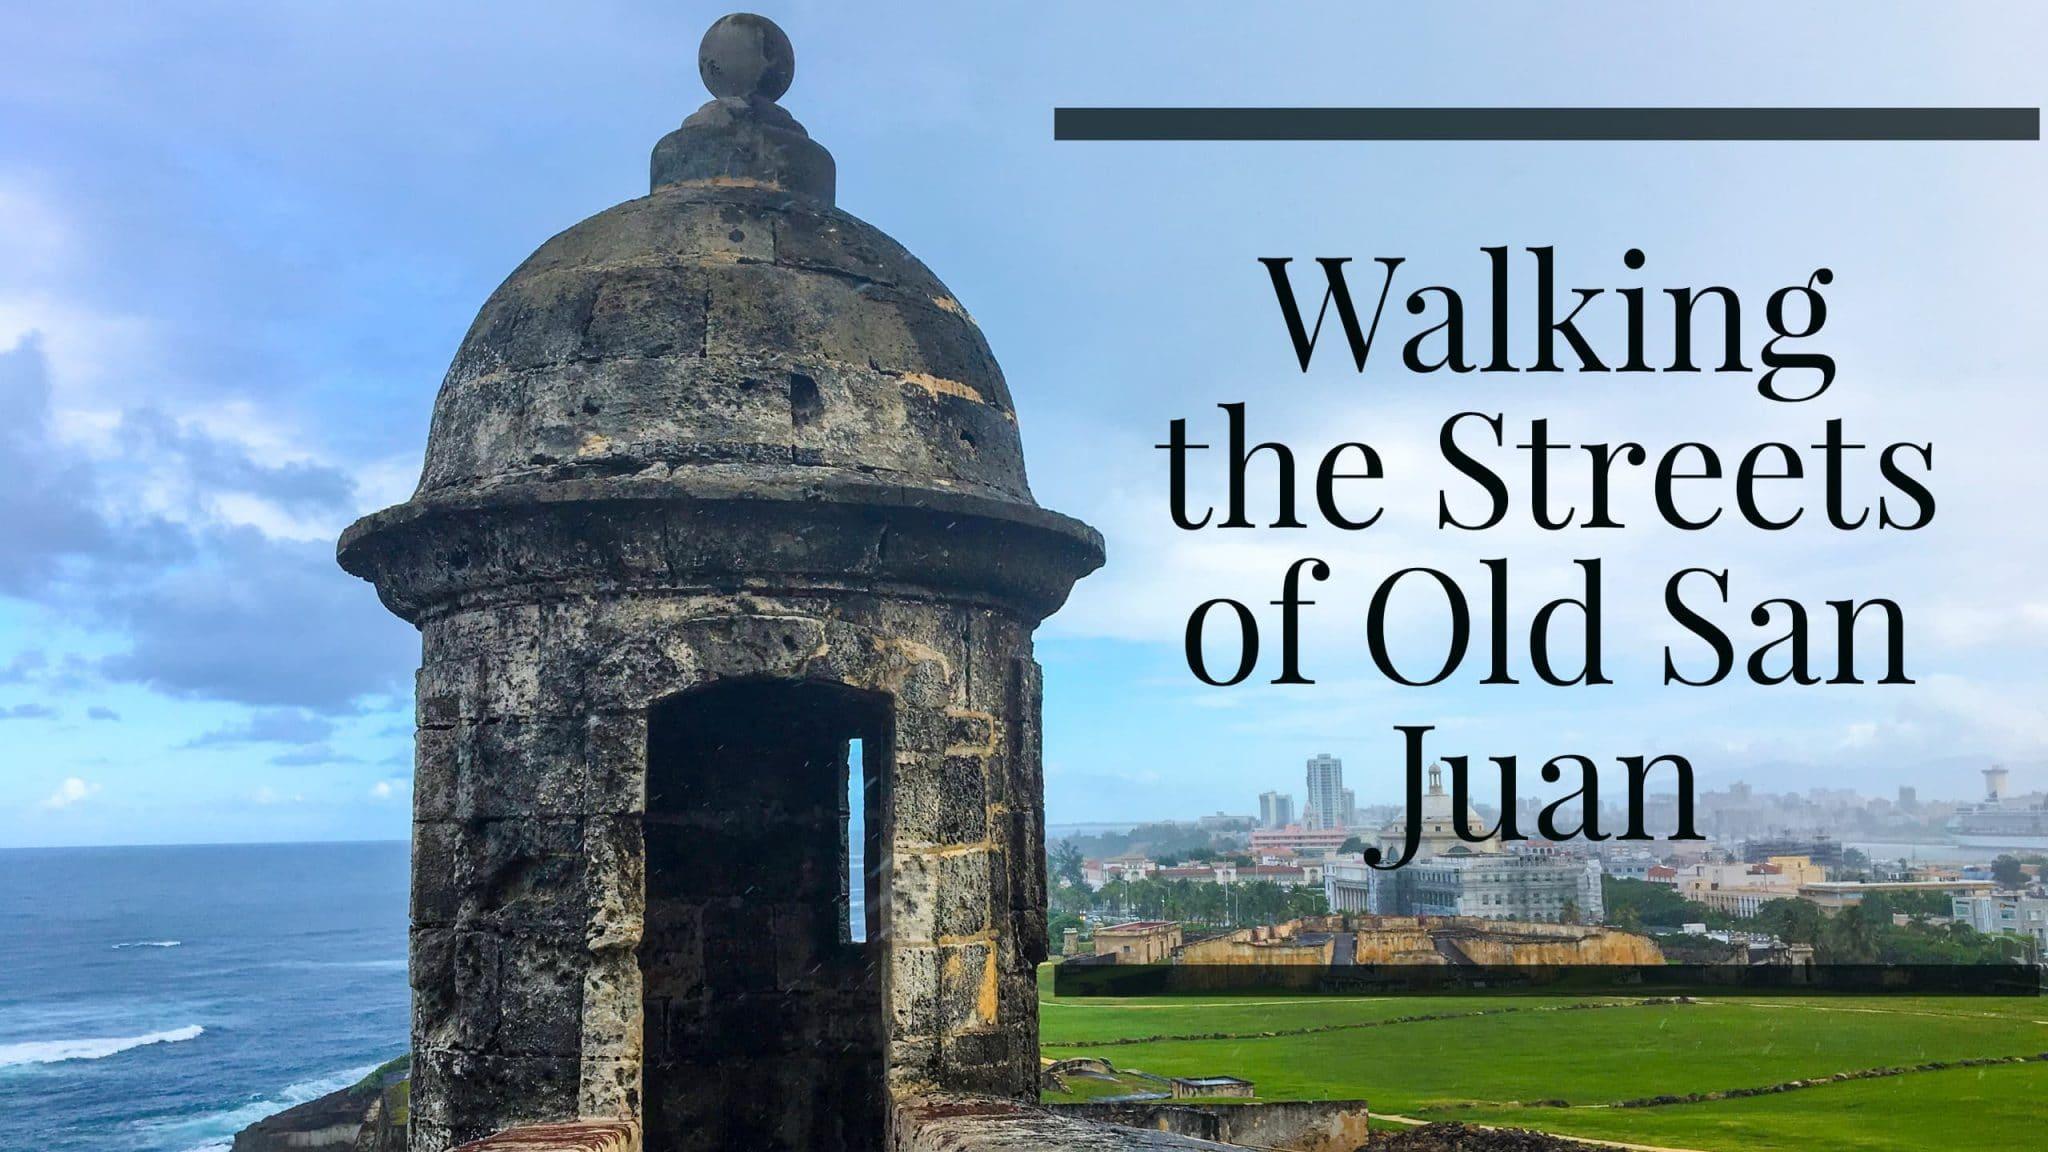 Walking the Streets of Old San Juan